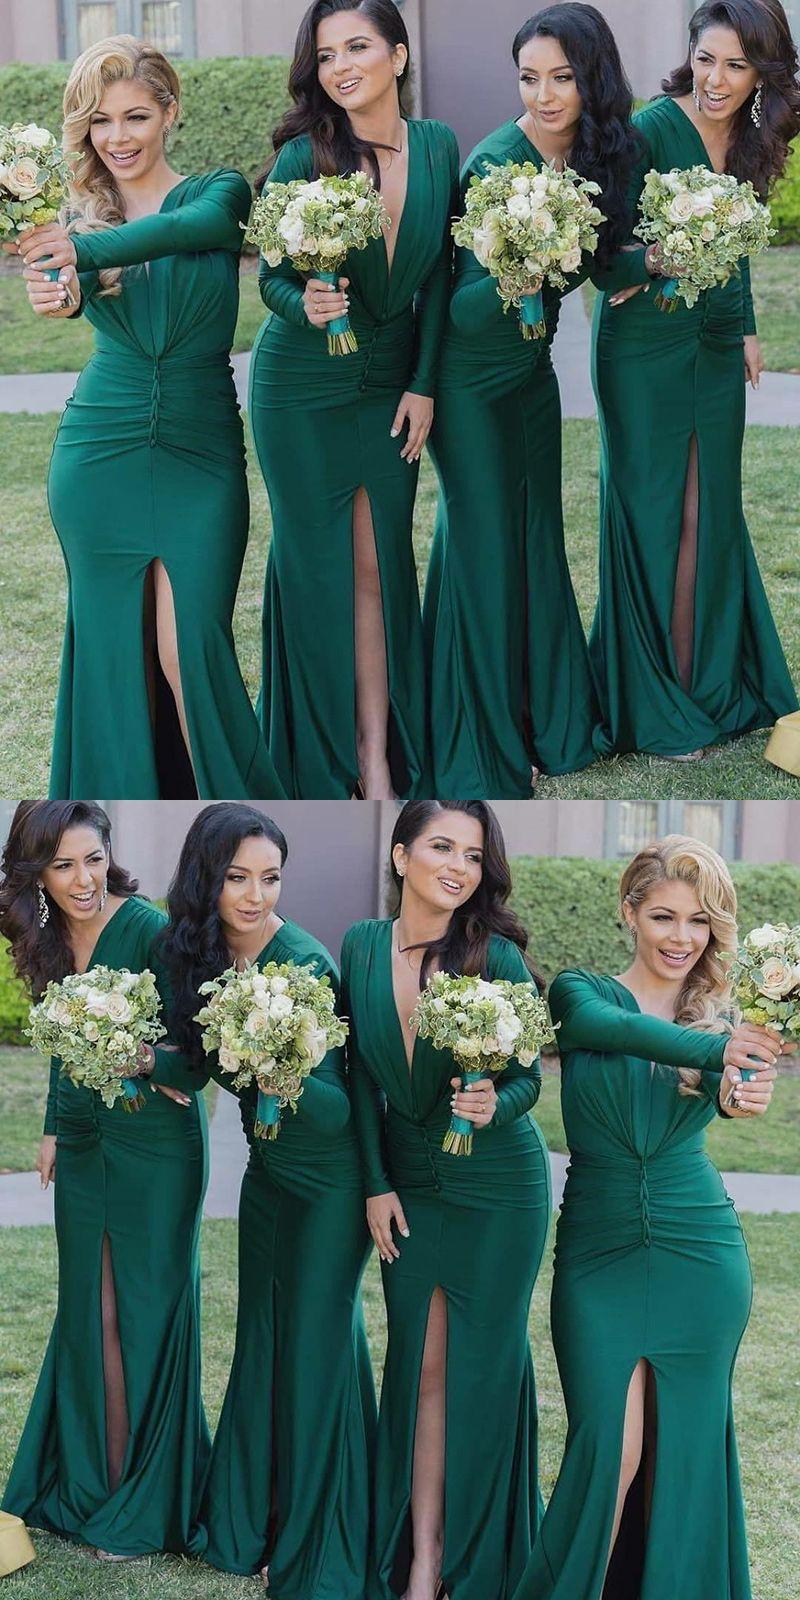 Mermaid V Neck Long Sleeves Long Hunter Bridesmaid Dress Simple Green Mermaid Bridesmaid Dresses With Mermaid Bridesmaid Dresses Bridesmaid Bridesmaid Dresses [ 1600 x 800 Pixel ]